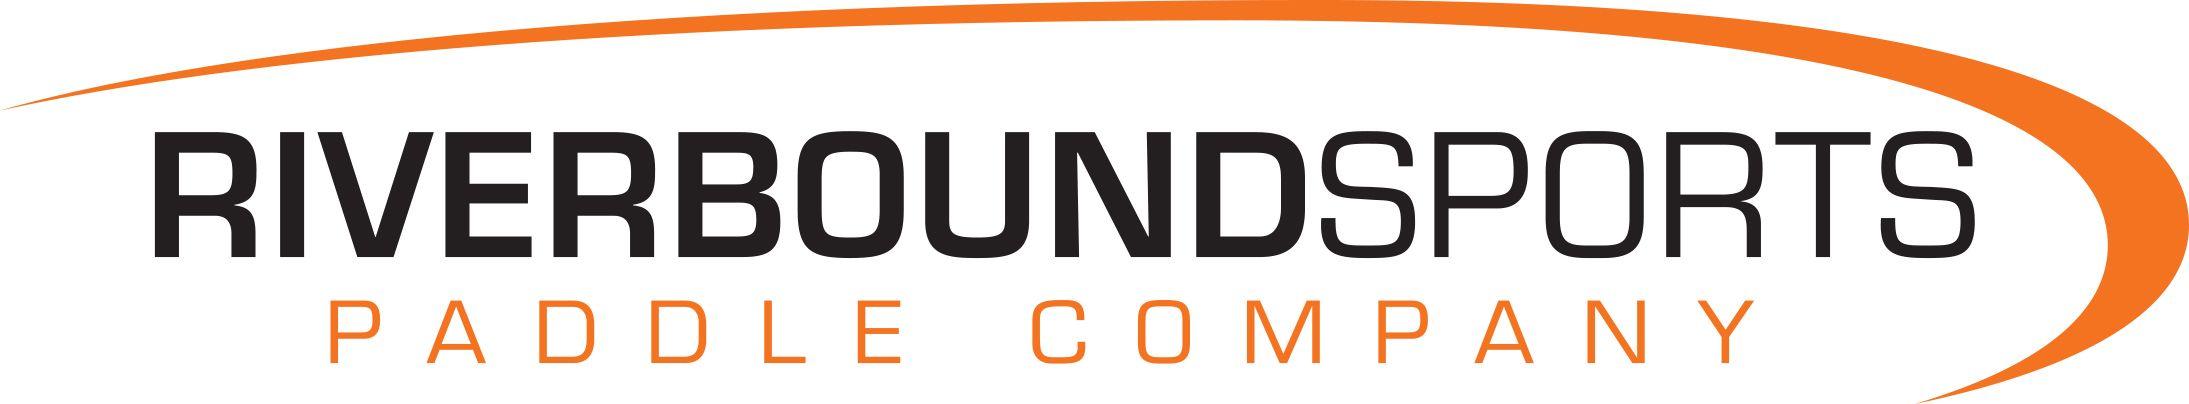 riverboundsports Logo